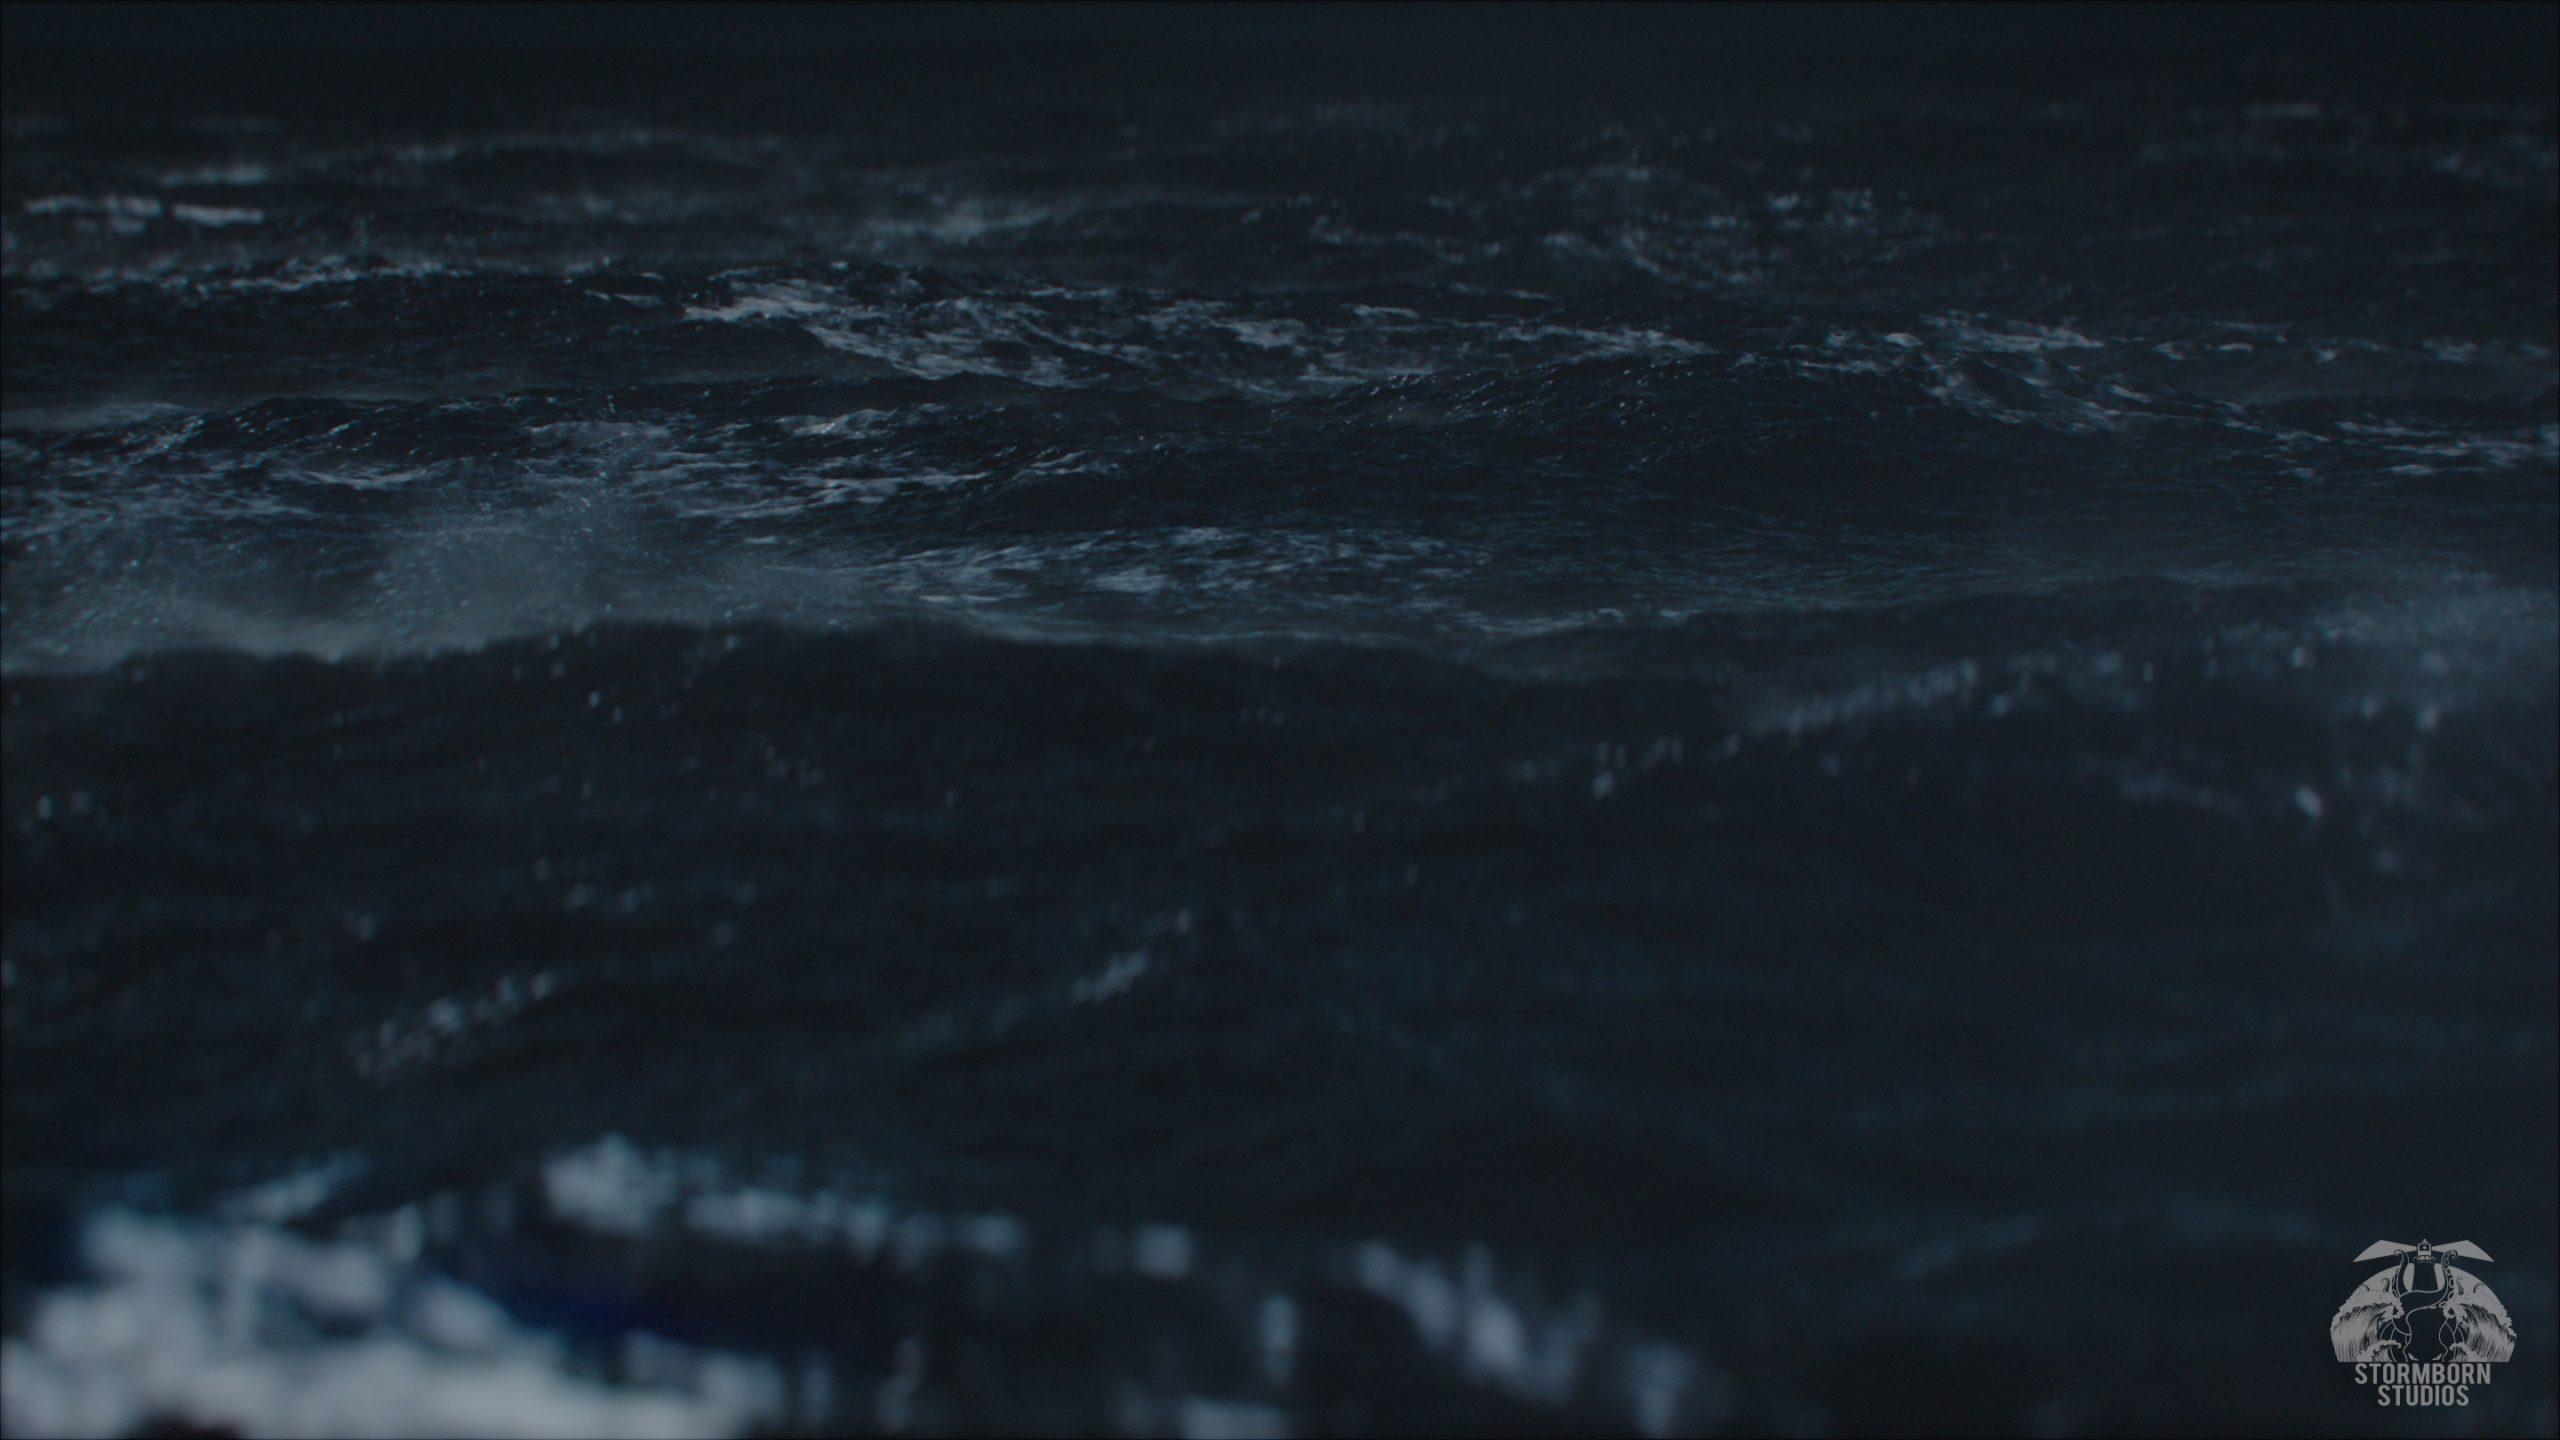 Stormborn Studios Ocean